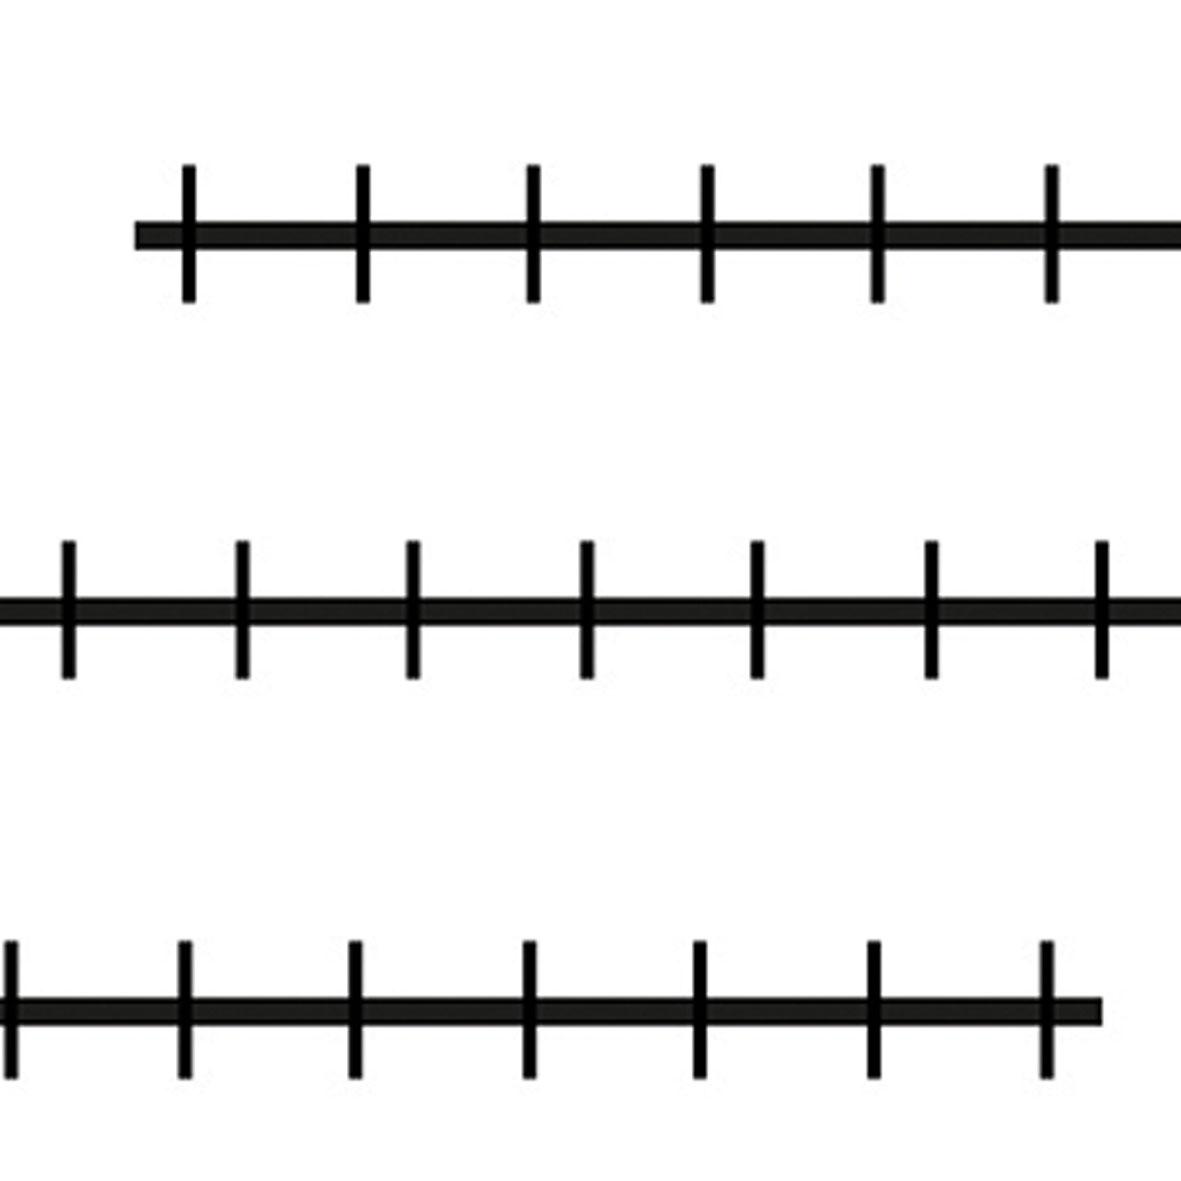 Number Lines on Blank Fraction Number Lines